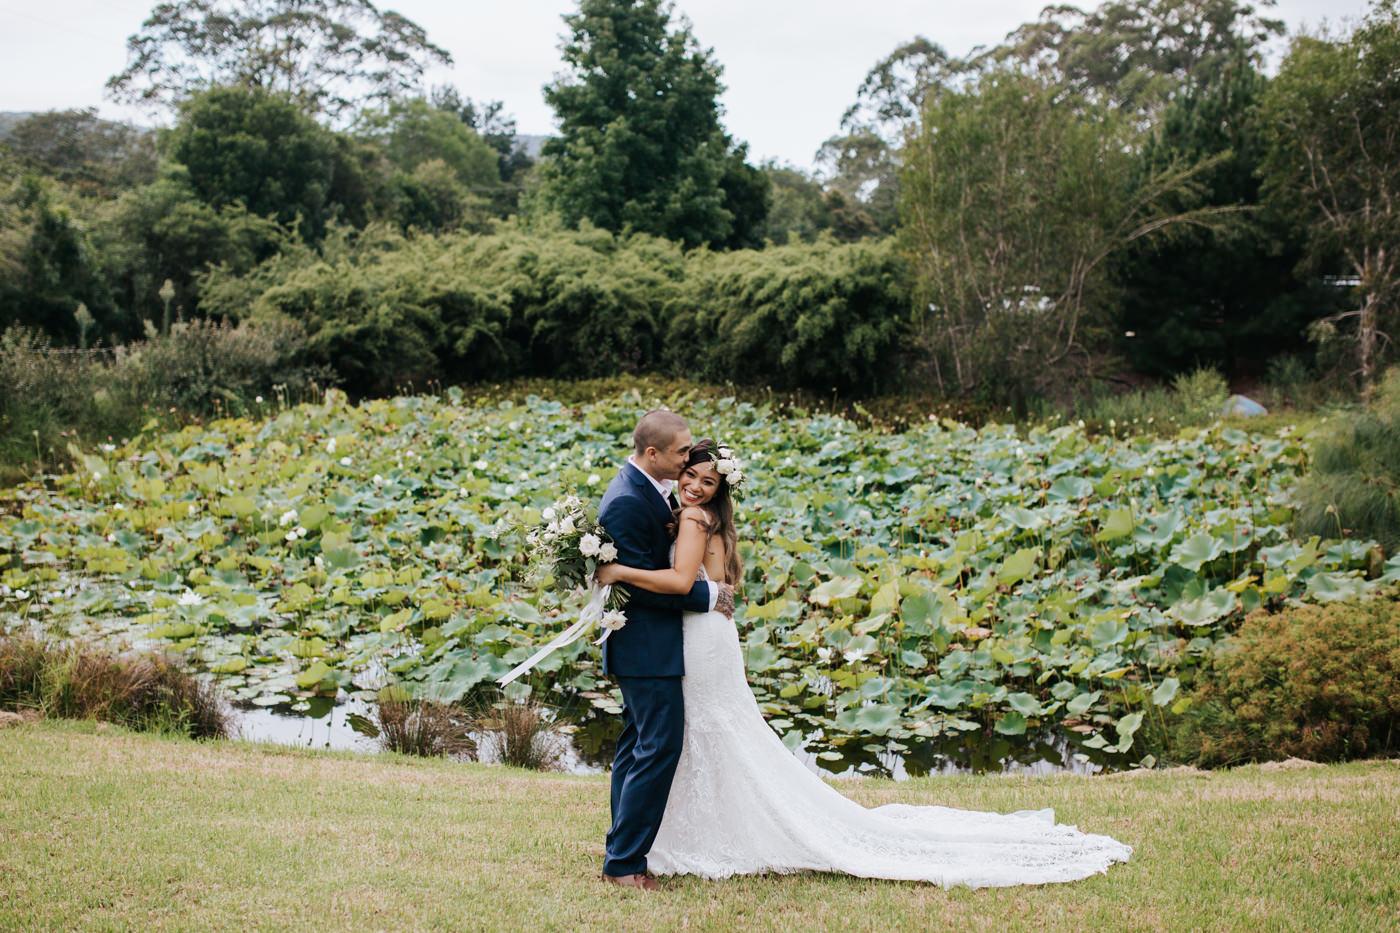 Nick & Vanezza - Fernbank Farm Wedding - Samantha Heather Photography-87.jpg